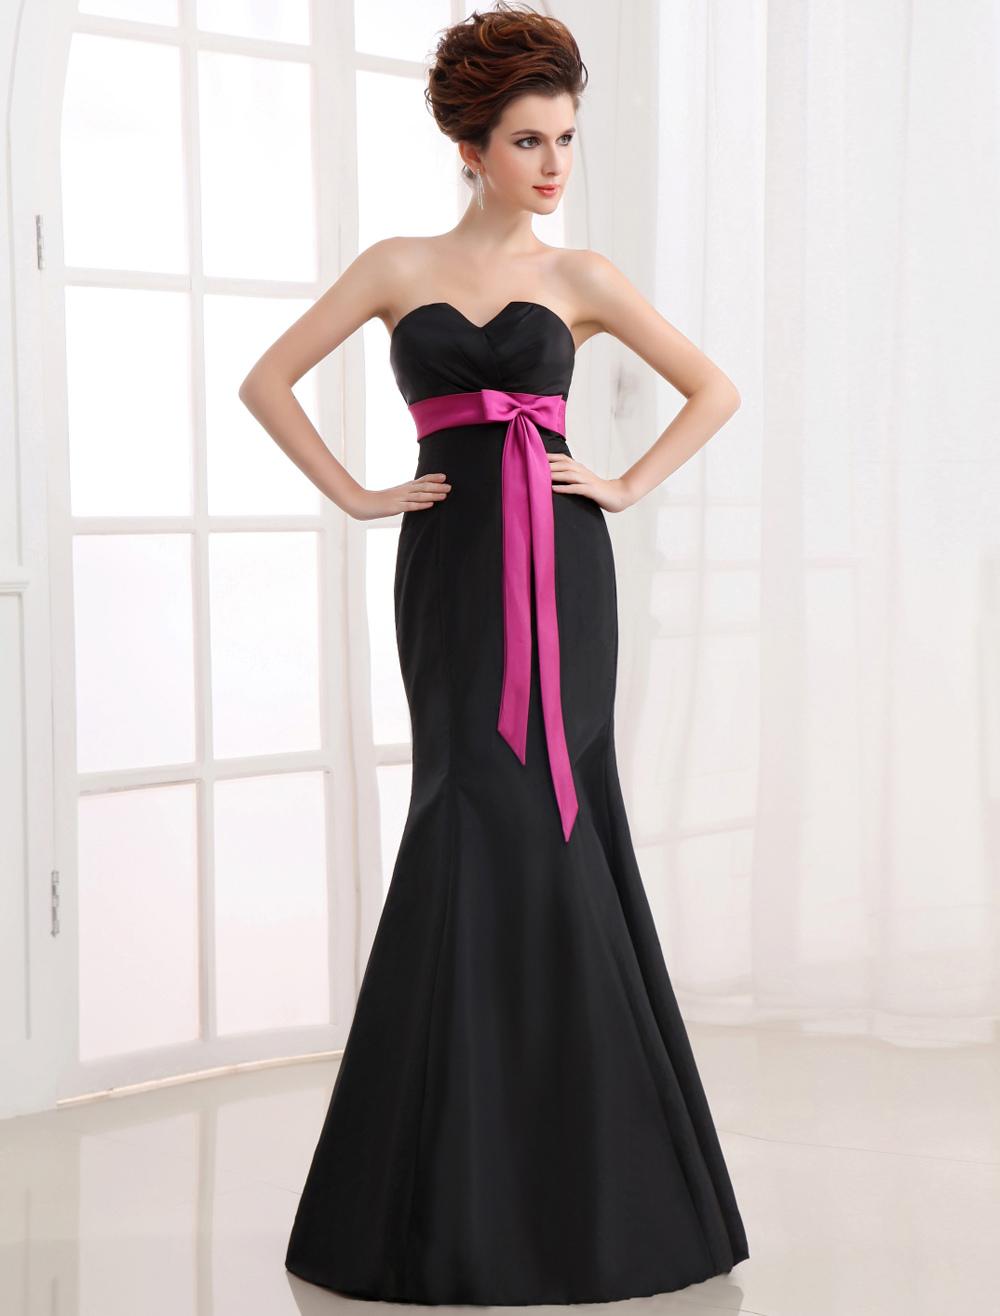 Black Evening Dress Mermaid Strapless Bow Sash Satin Dress